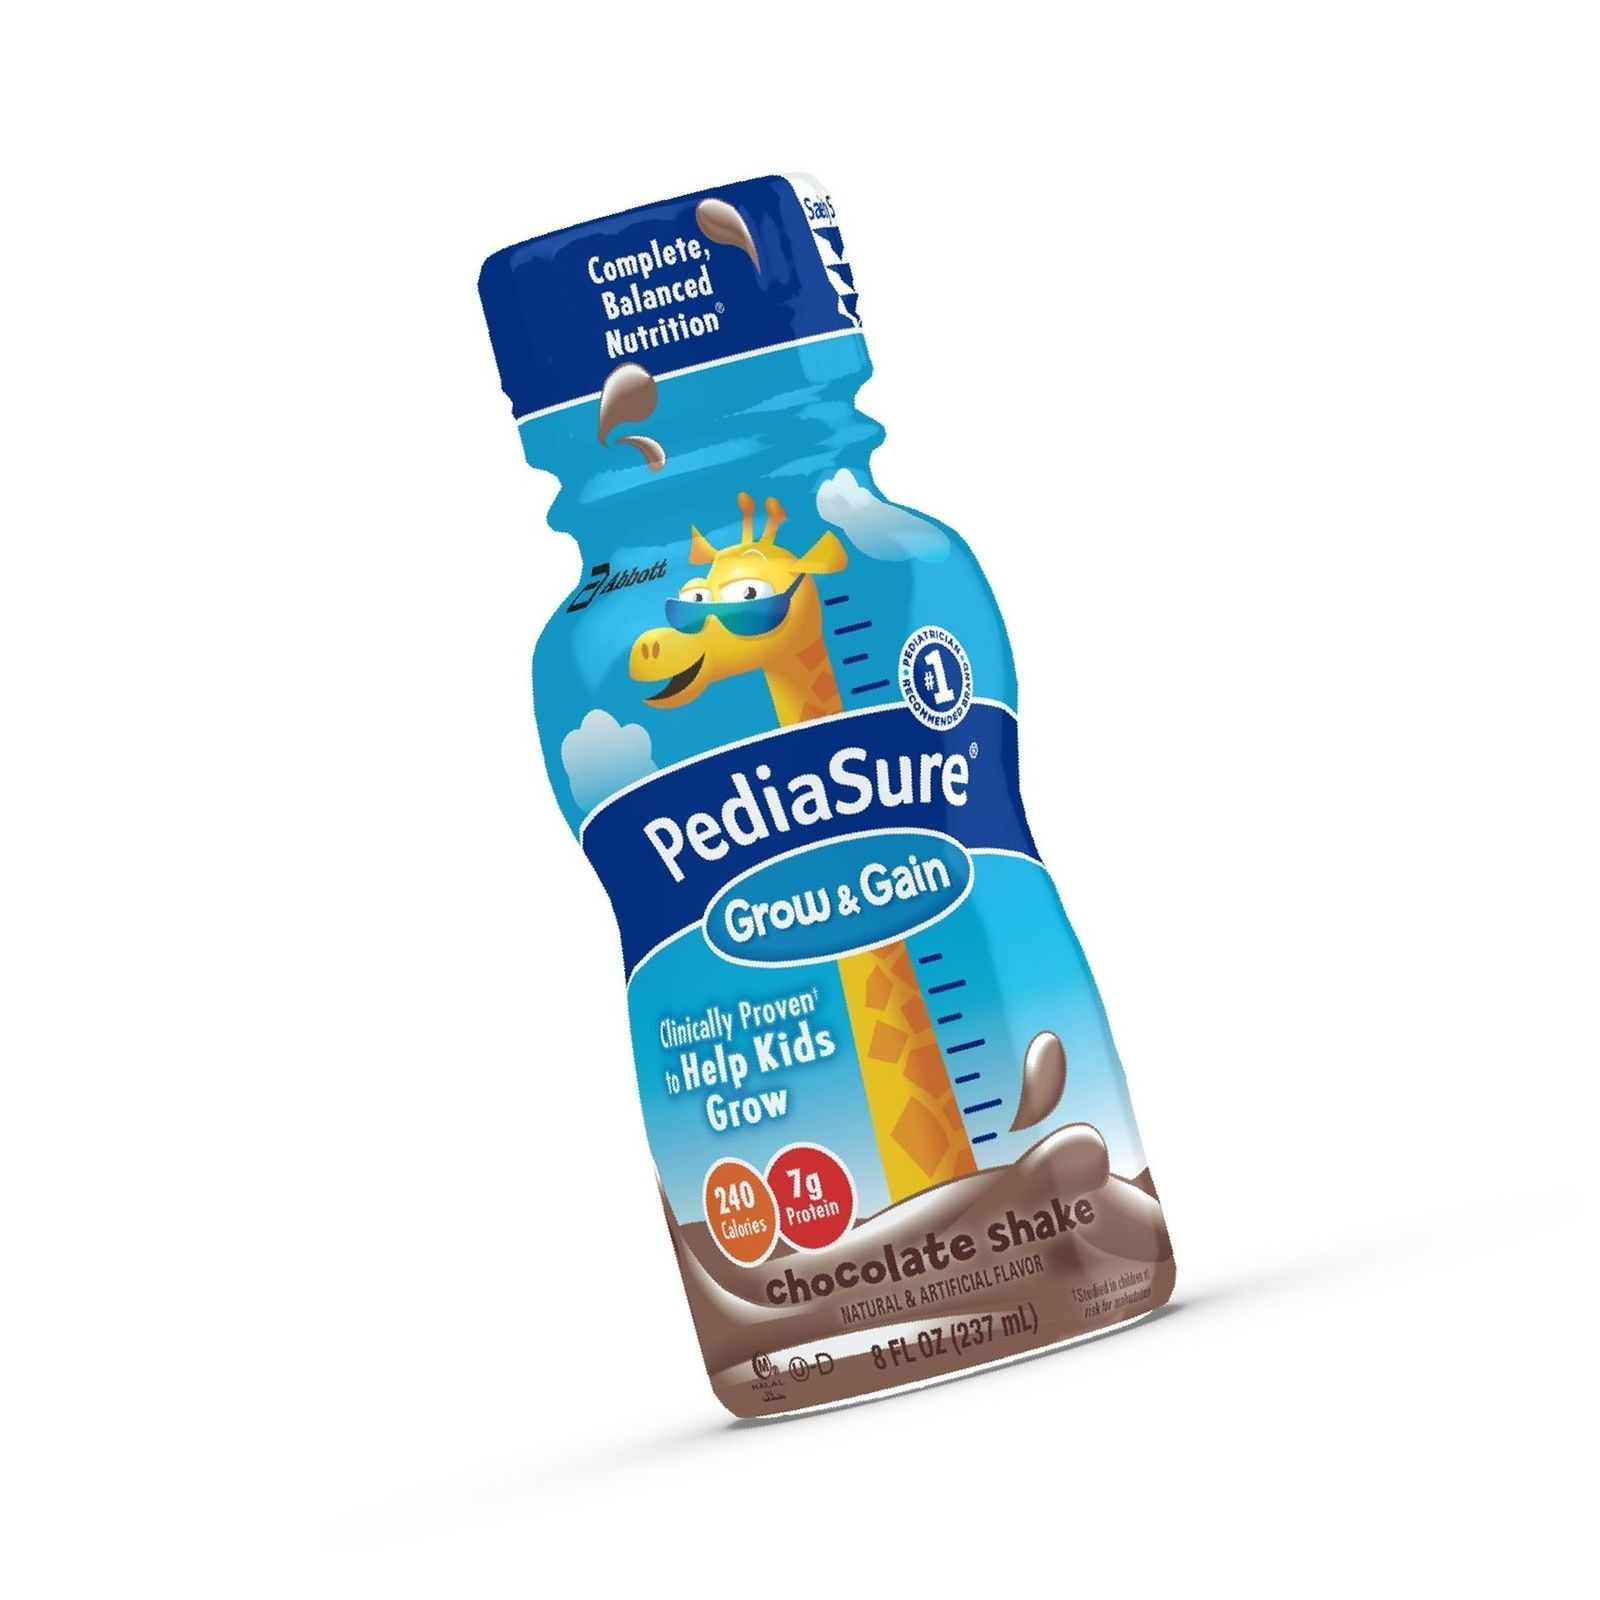 PediaSure Grow & Gain Nutrition Shake For Kids Chocolate 8 fl oz (Pack of 24)